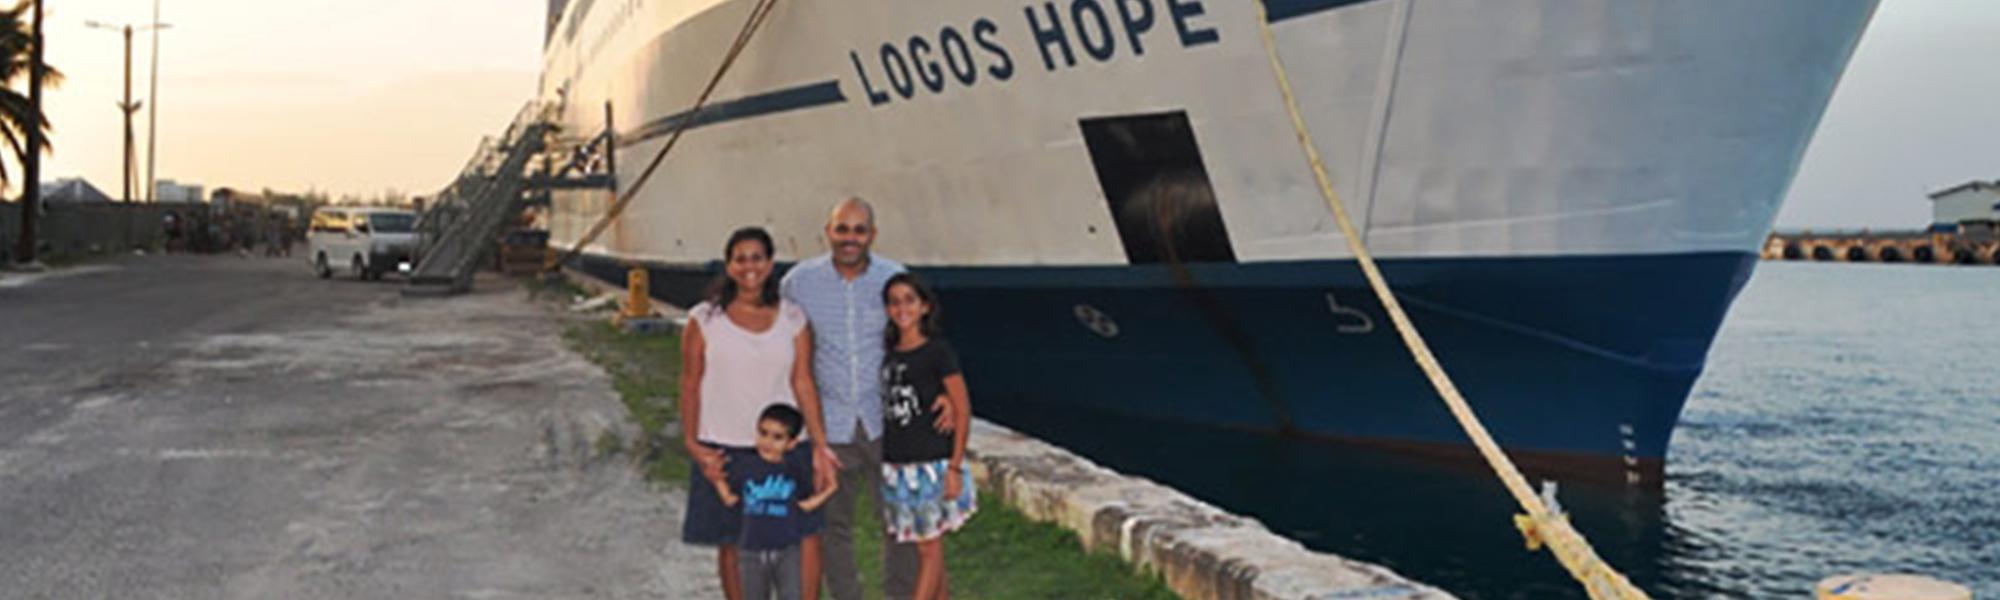 The DeLimas Family